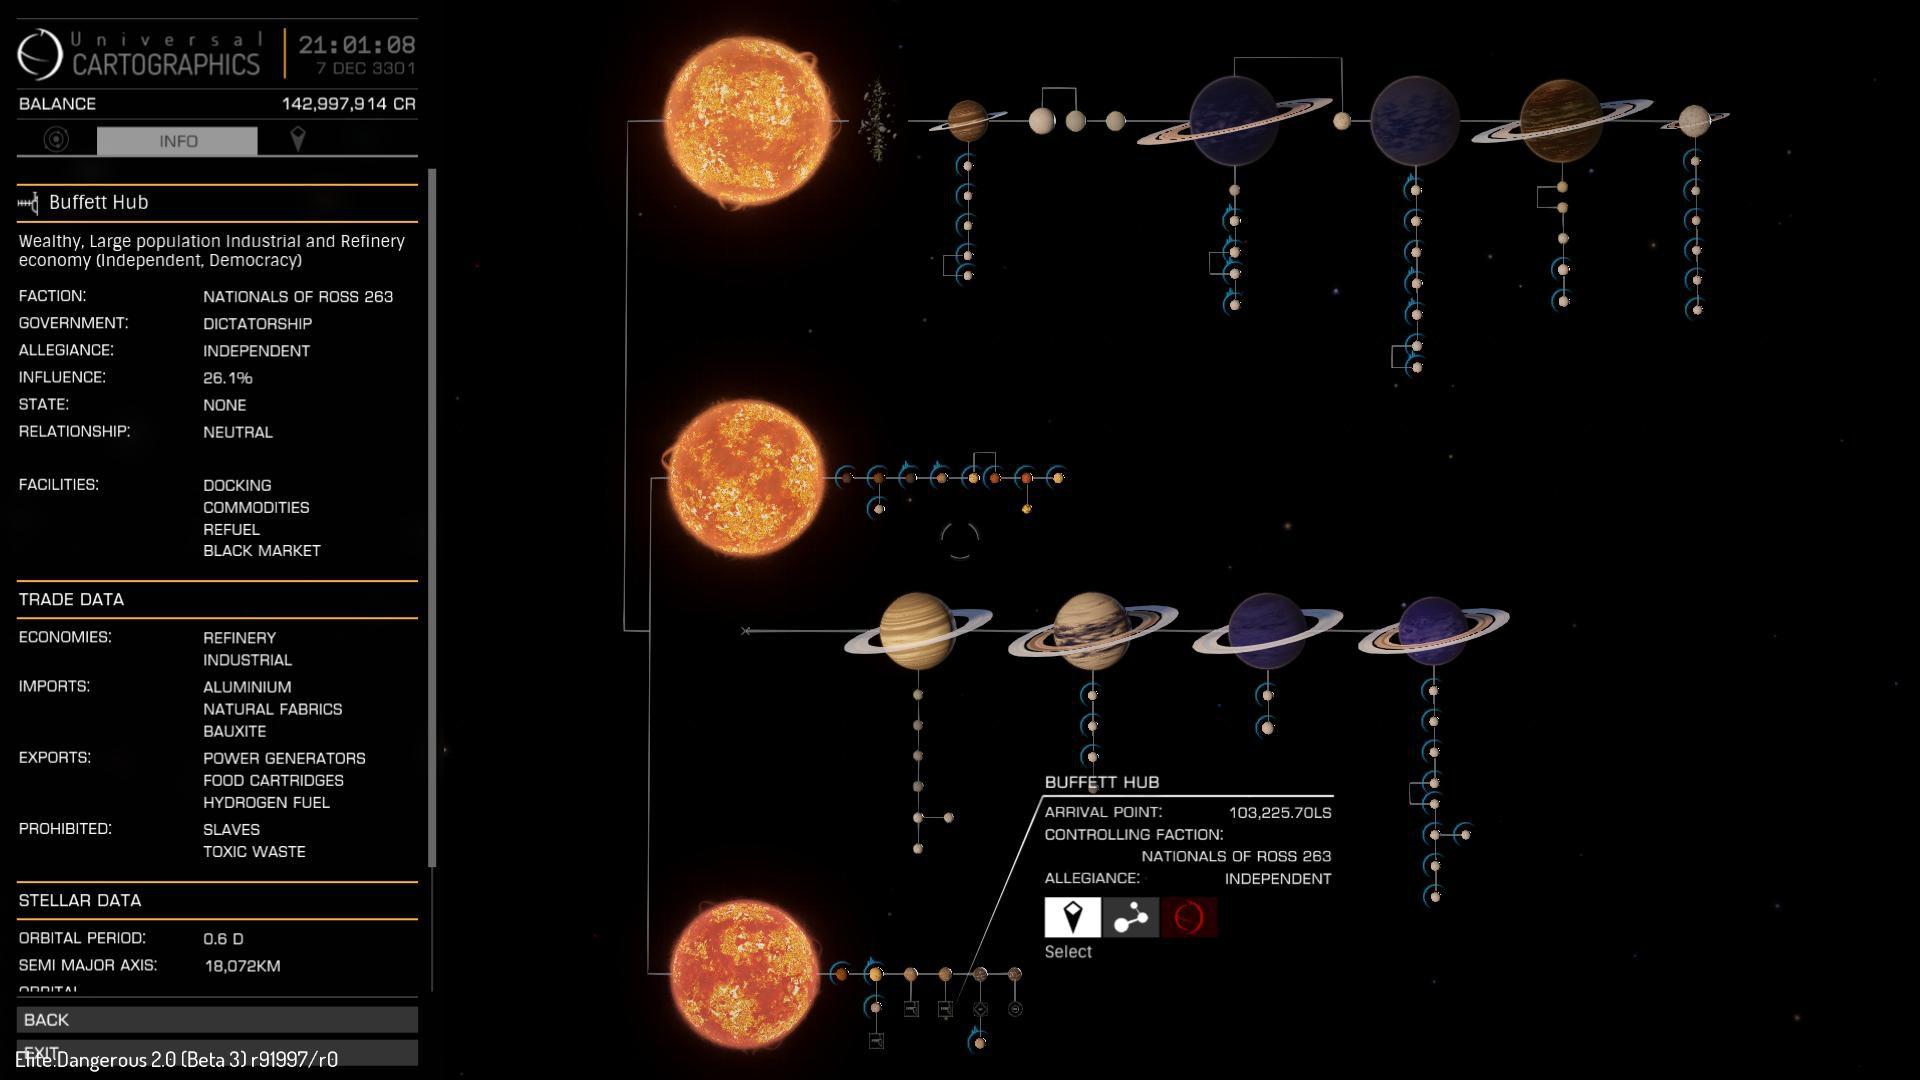 elite_system_map_horizons